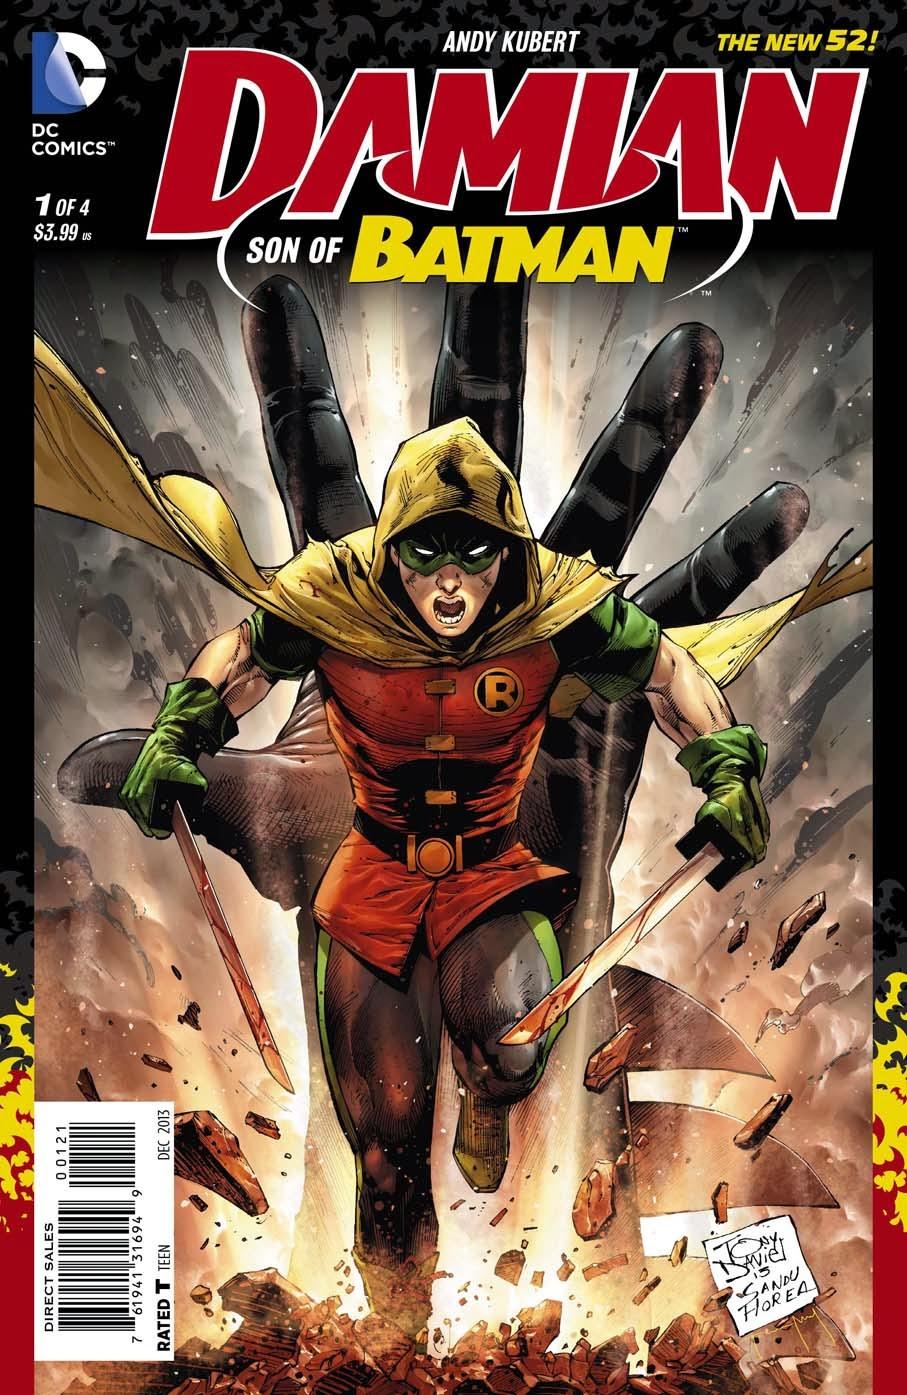 Leer Damian: Hijo de Batman / Son of Batman Online en Español